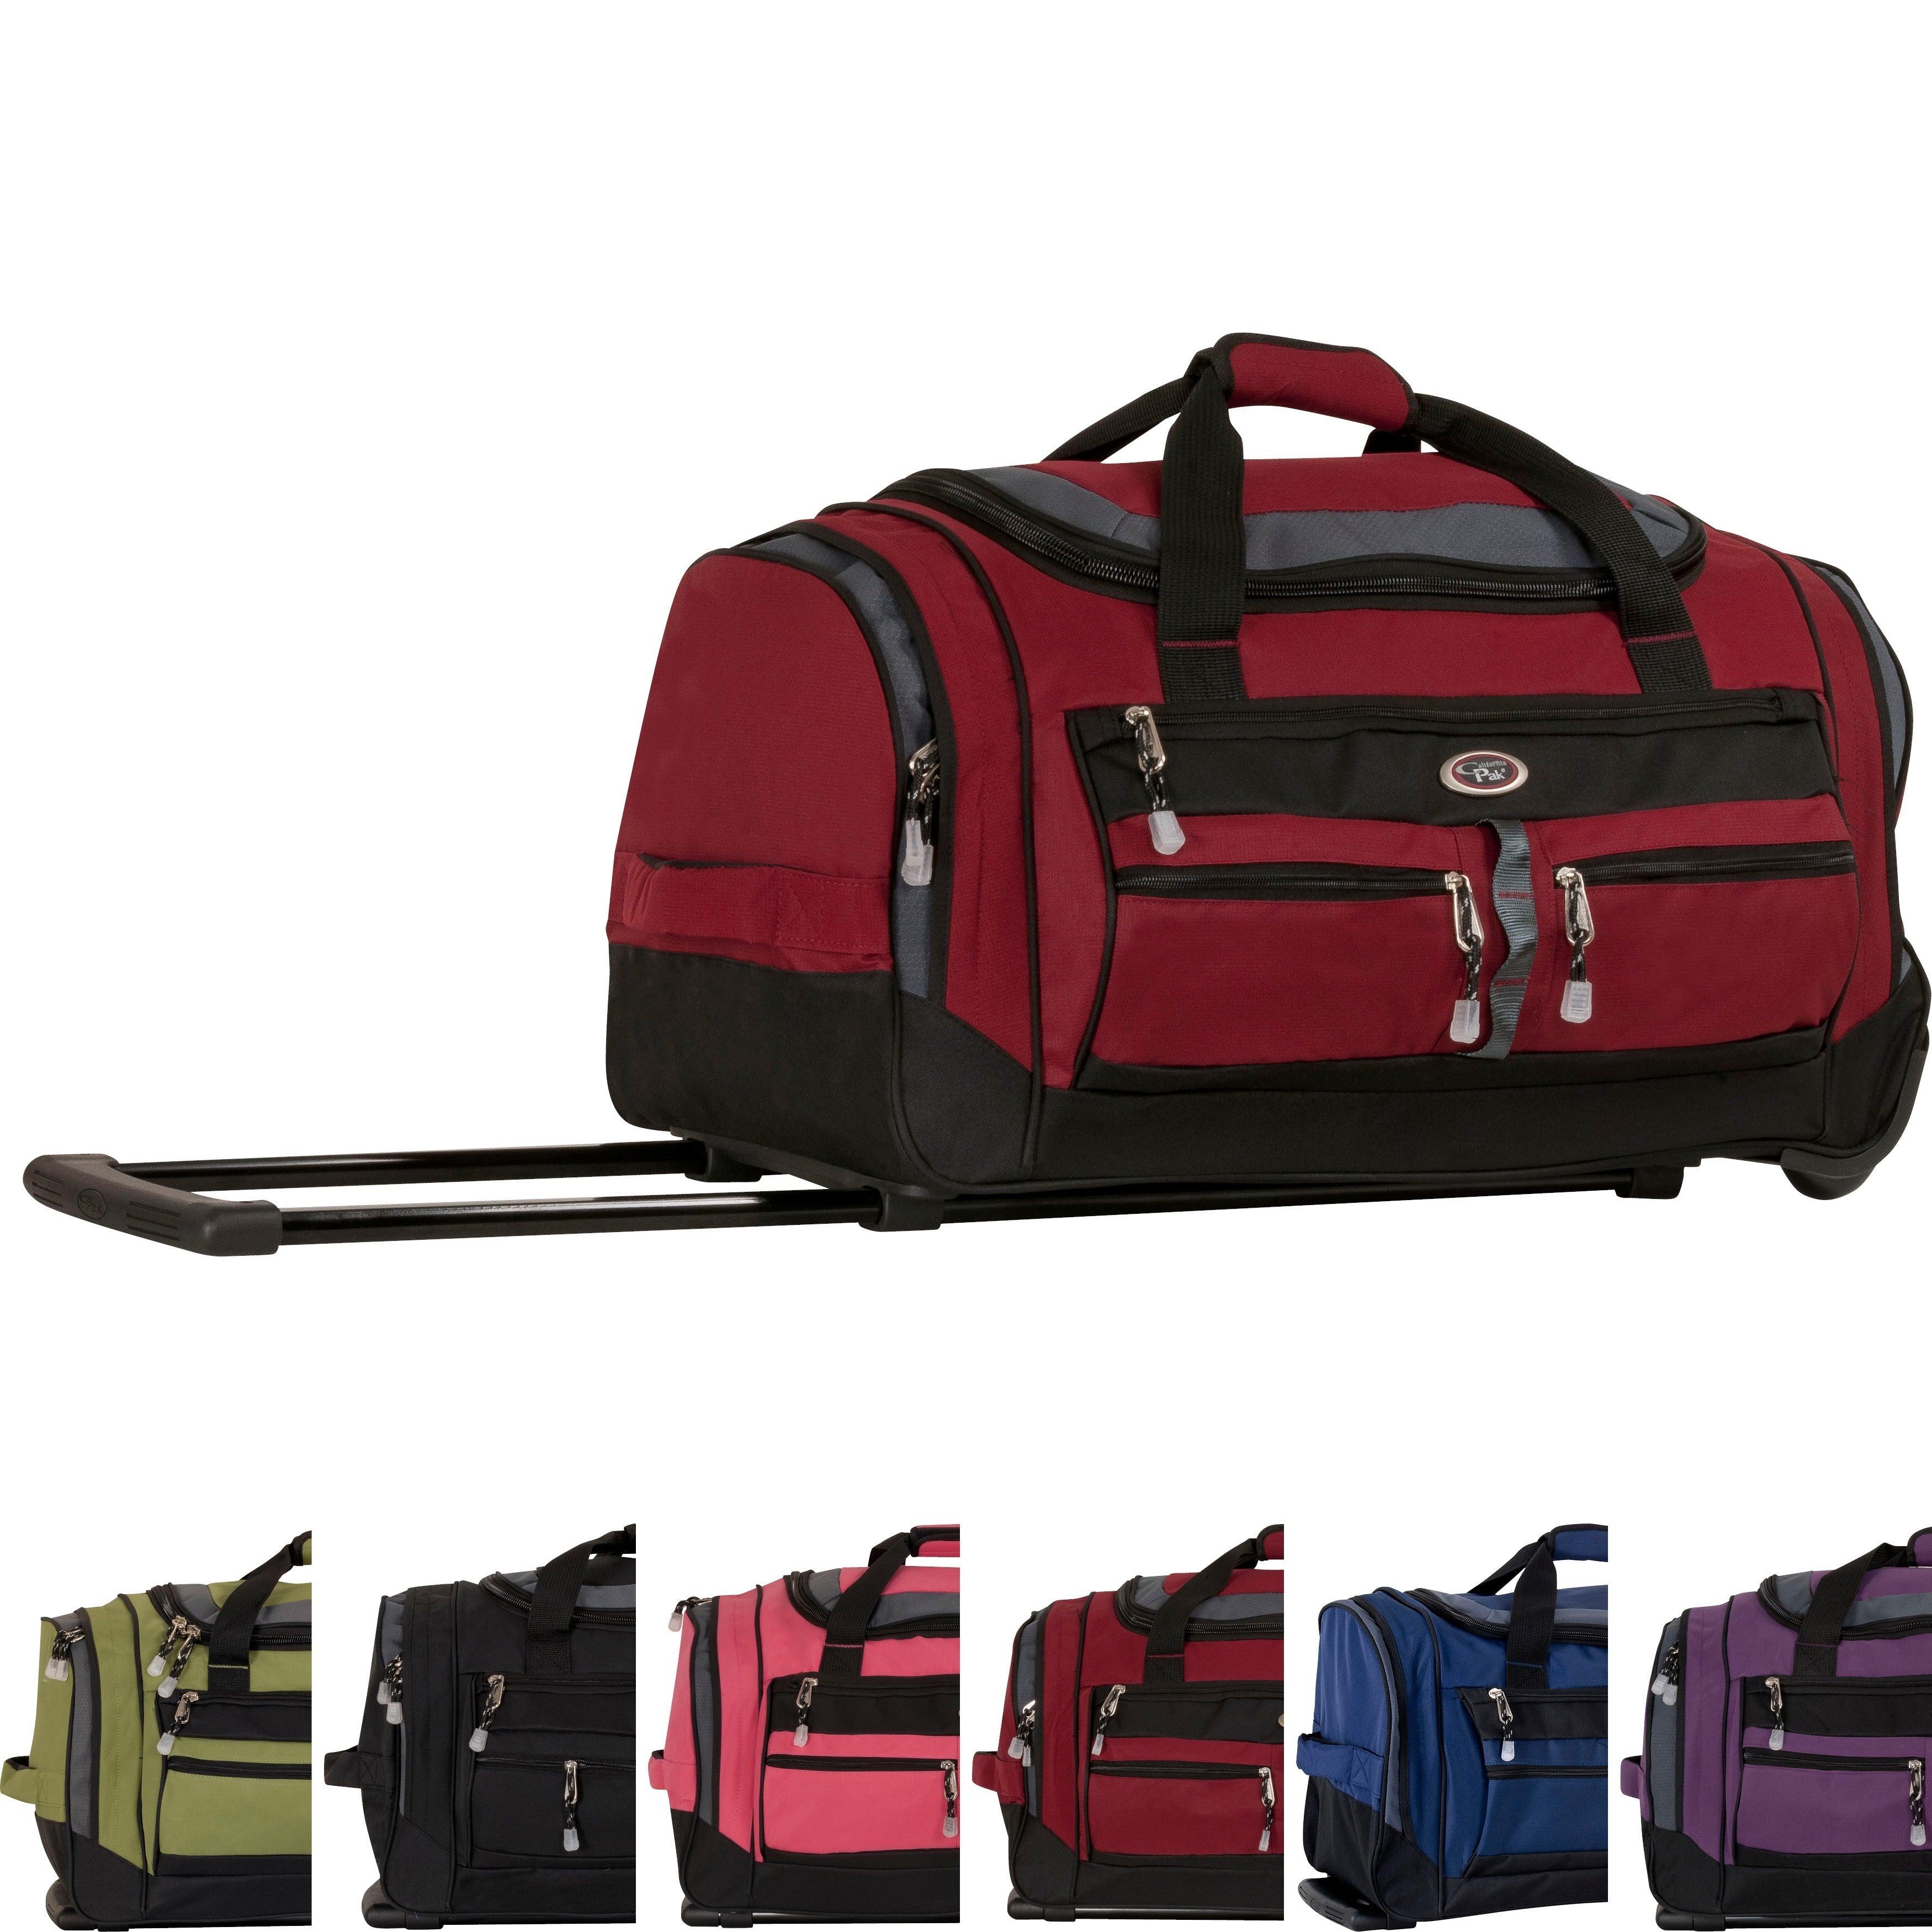 Shoes for men online Design your own duffel bag online